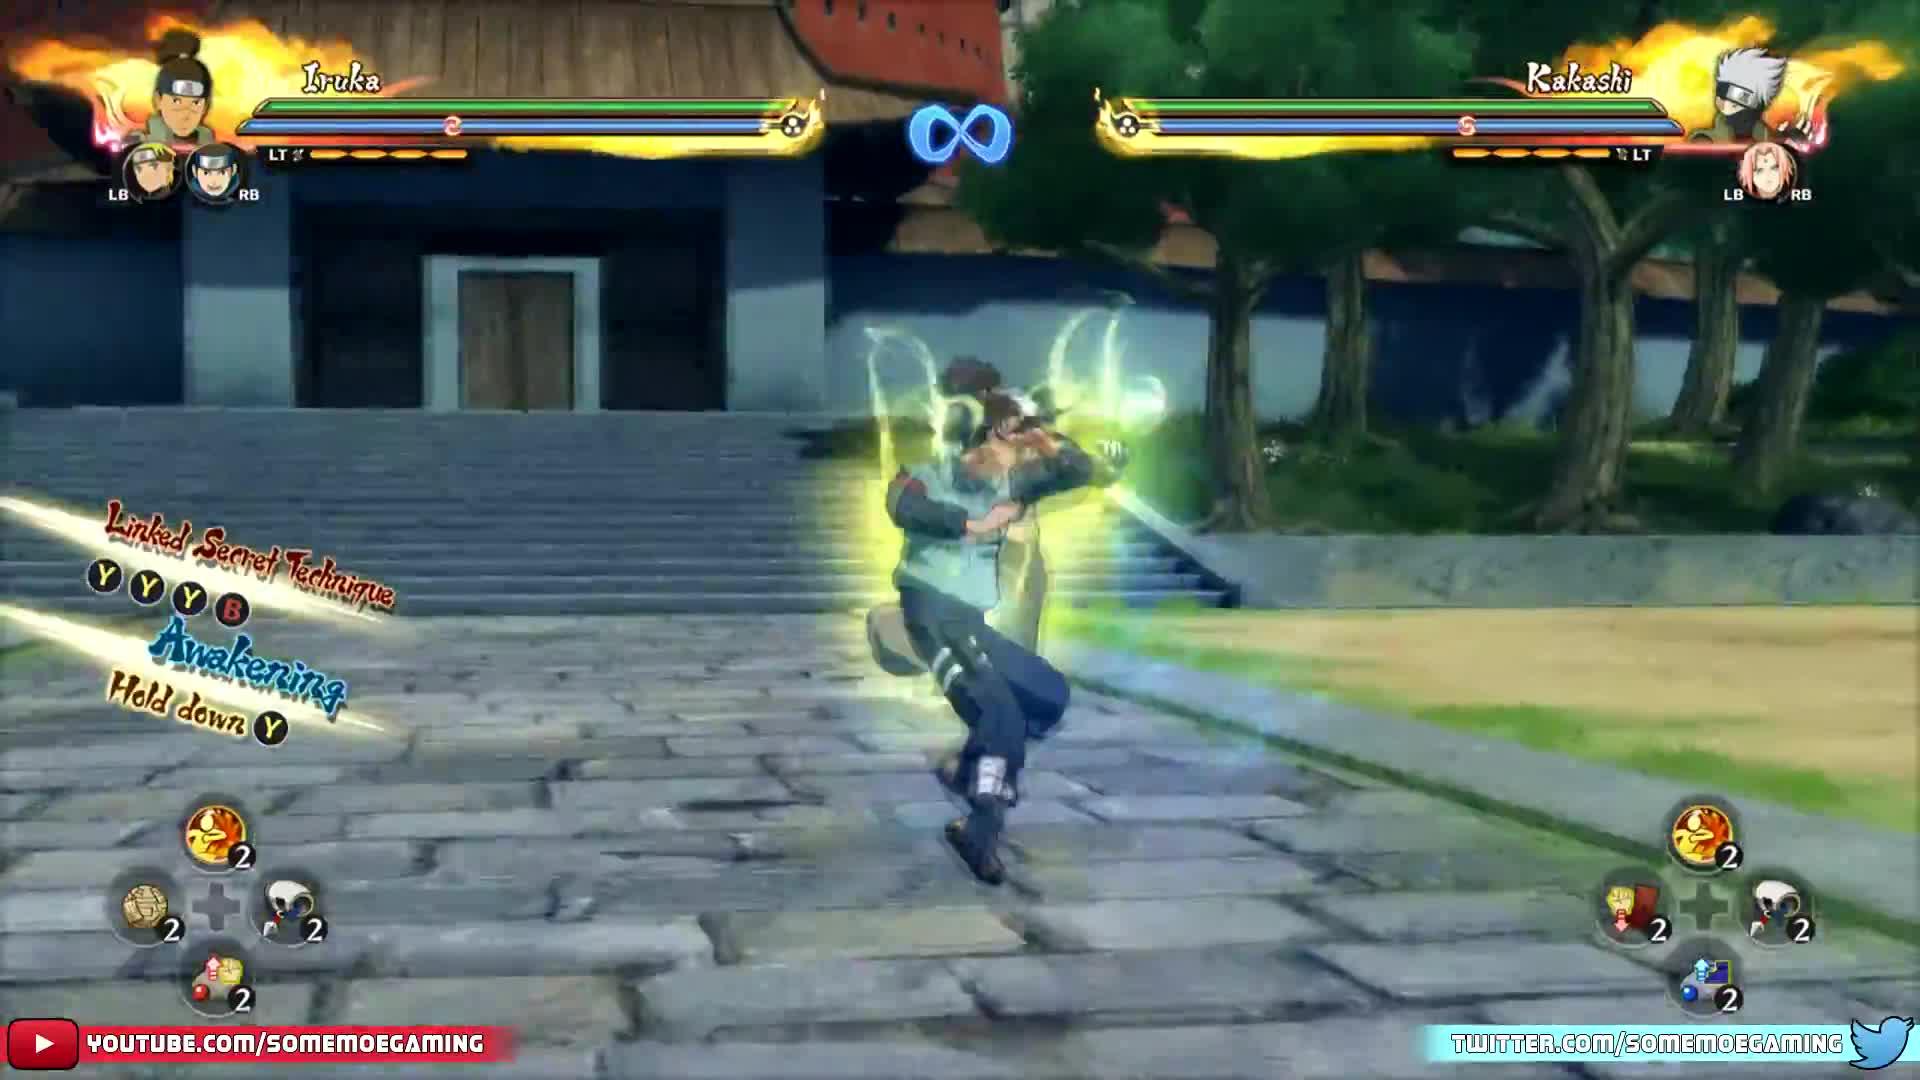 Naruto Ultimate Ninja Storm 4 Pc Gifs Search   Search